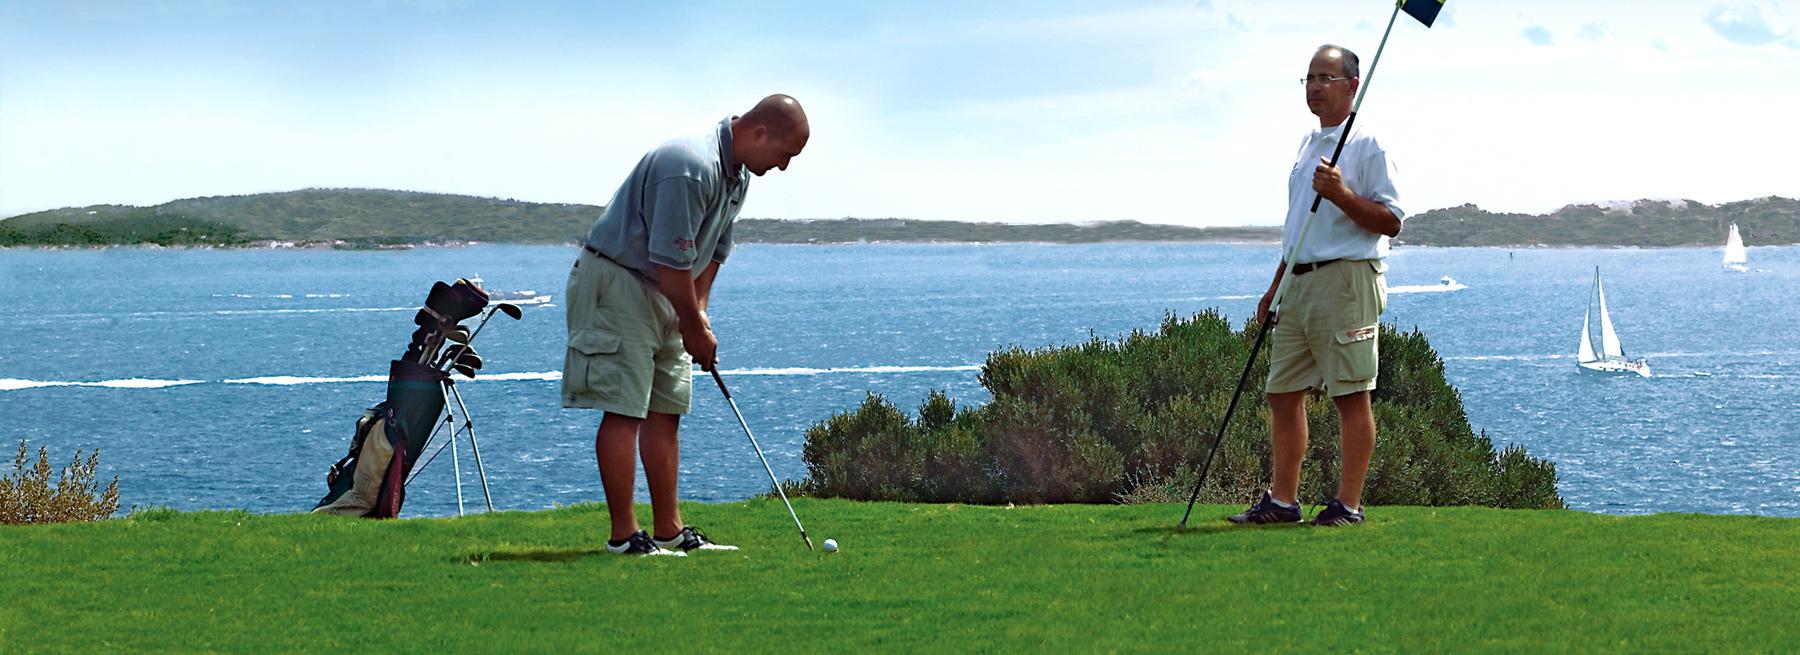 gruppo-delphina_slider_sport-golf-p-p-1